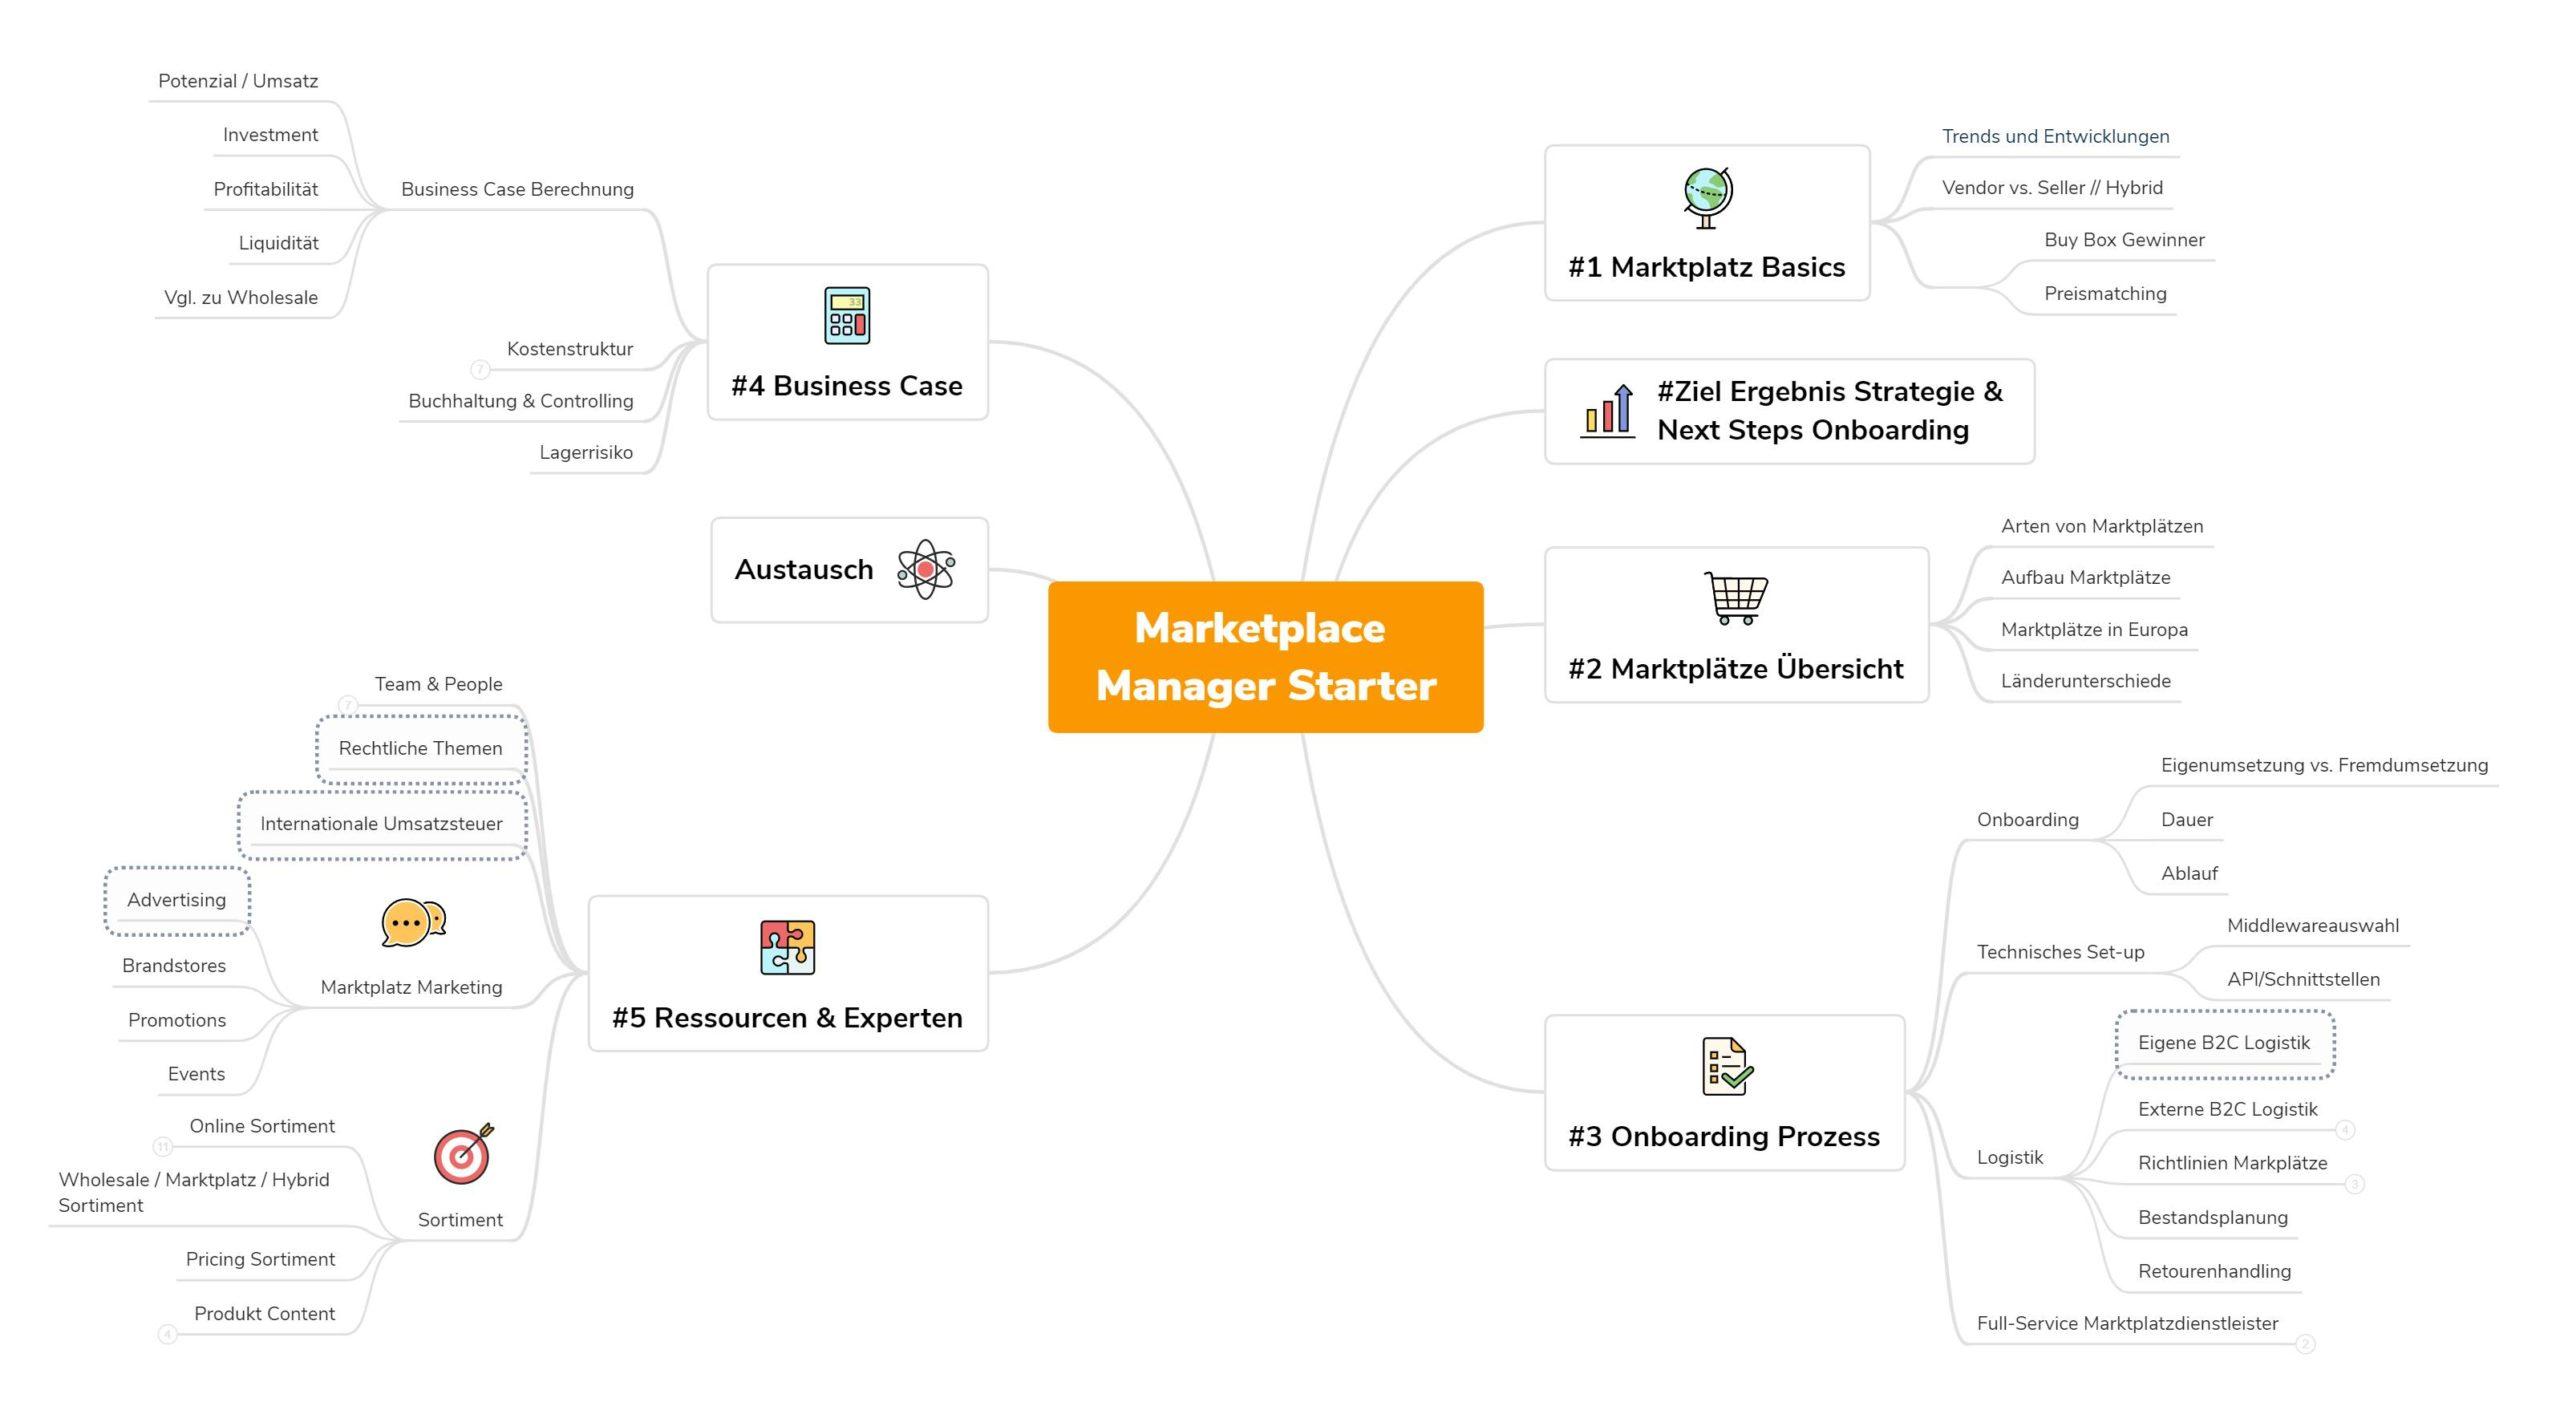 202105_Marketplace Manager Starter Kompetenzfelder_DE_web